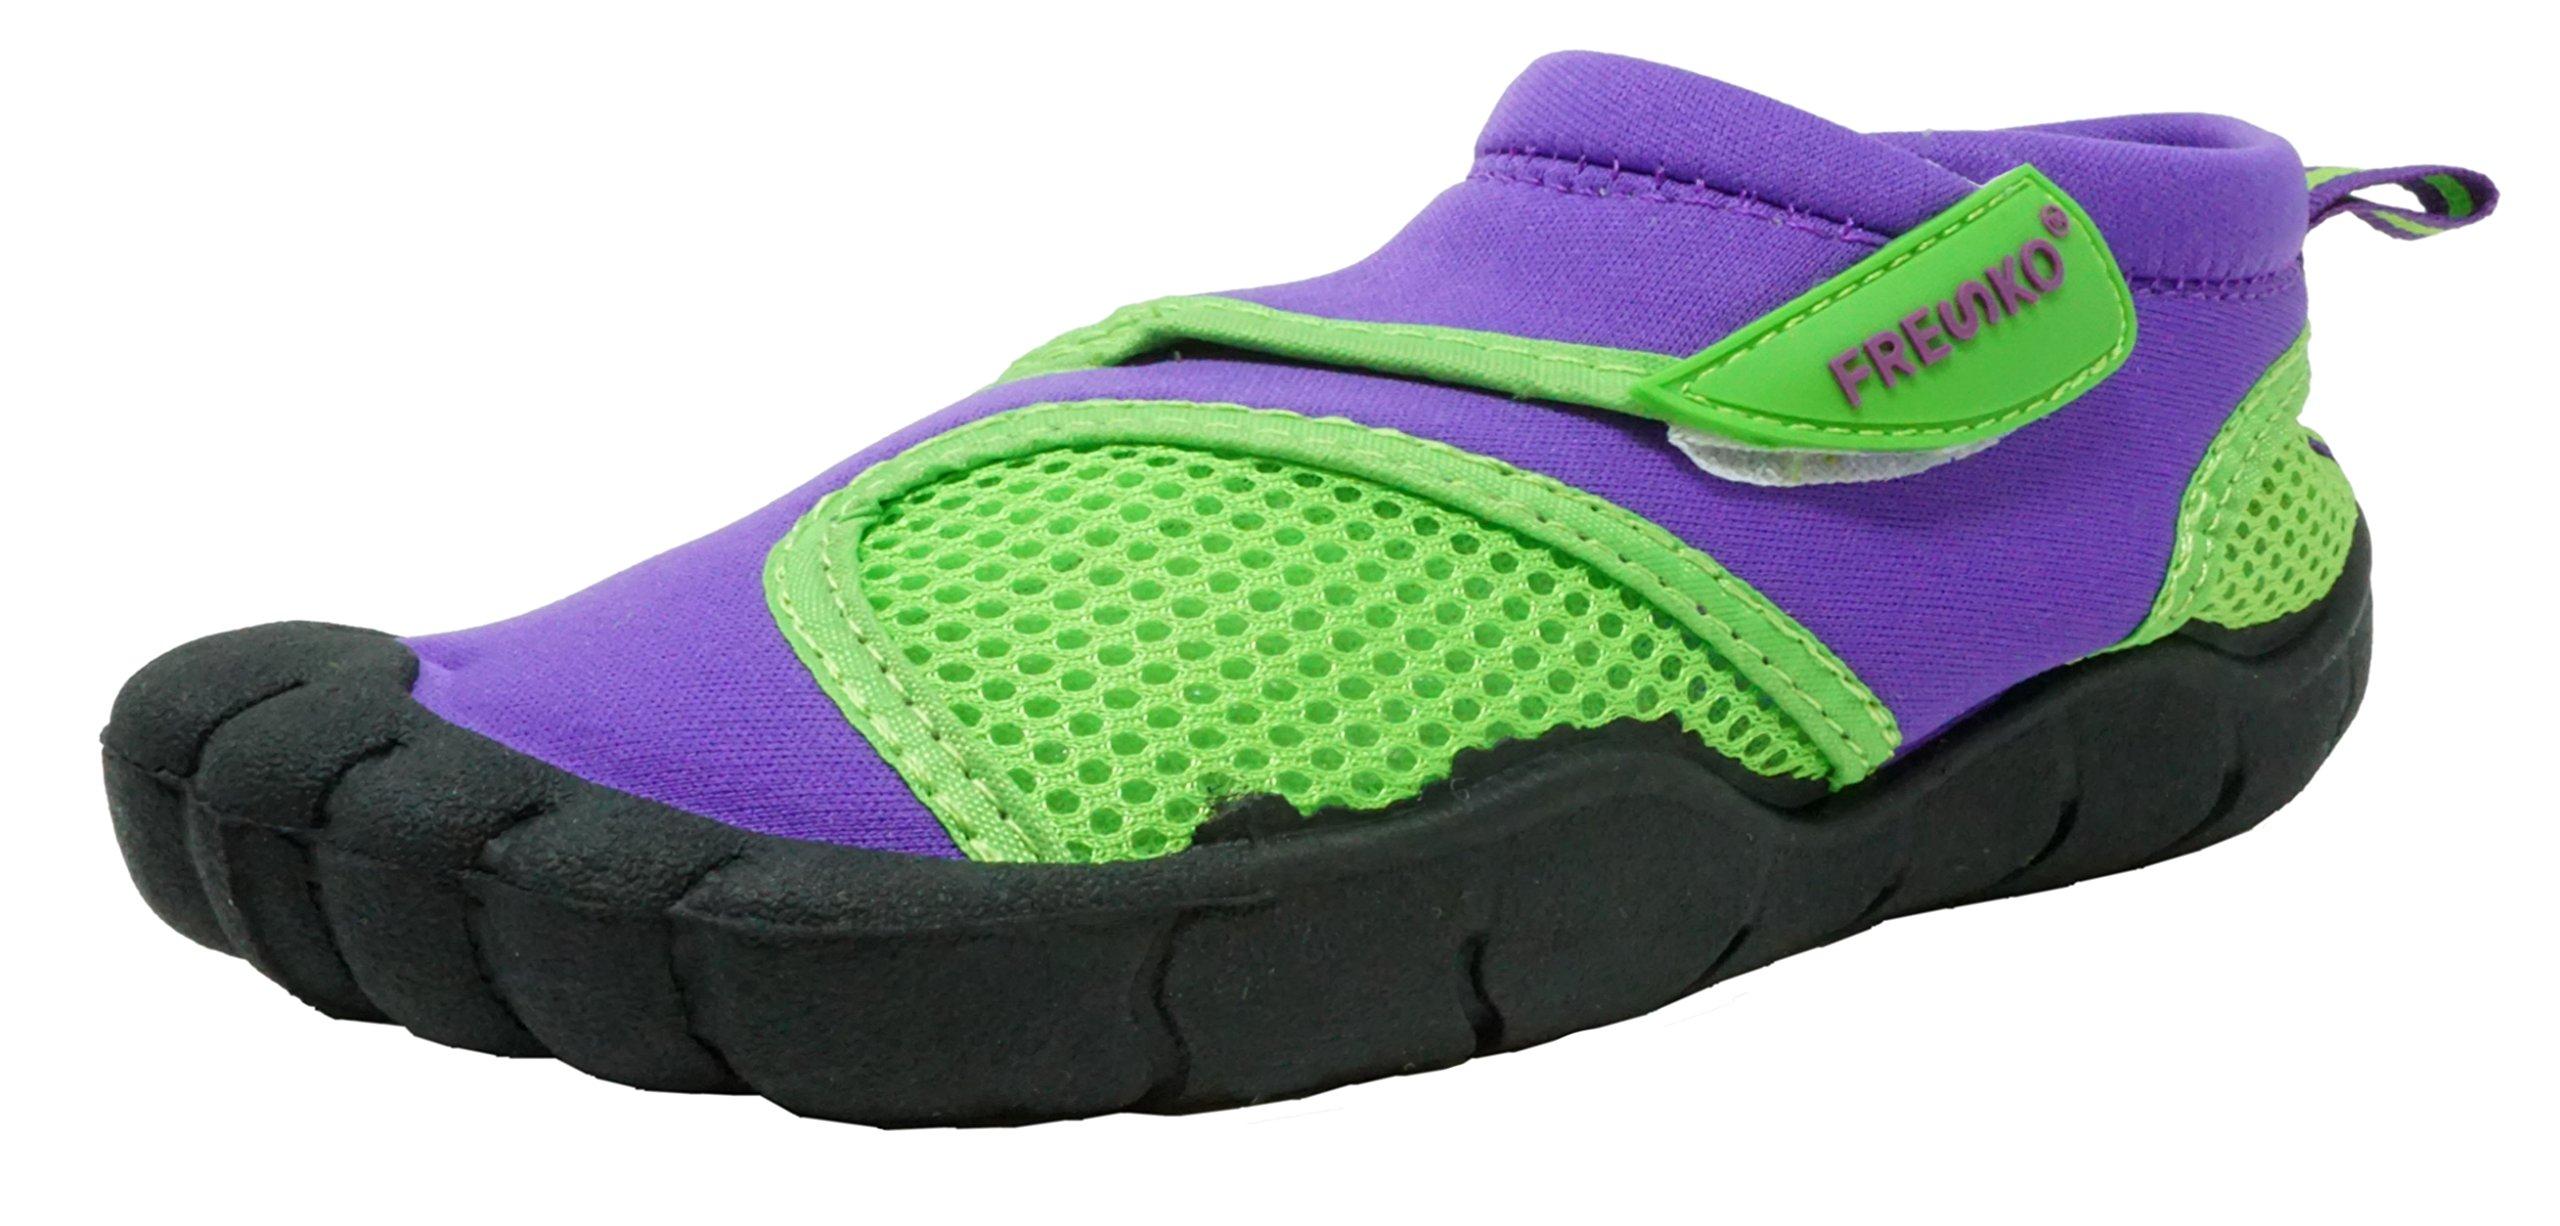 Fresko Kids Water Shoes for